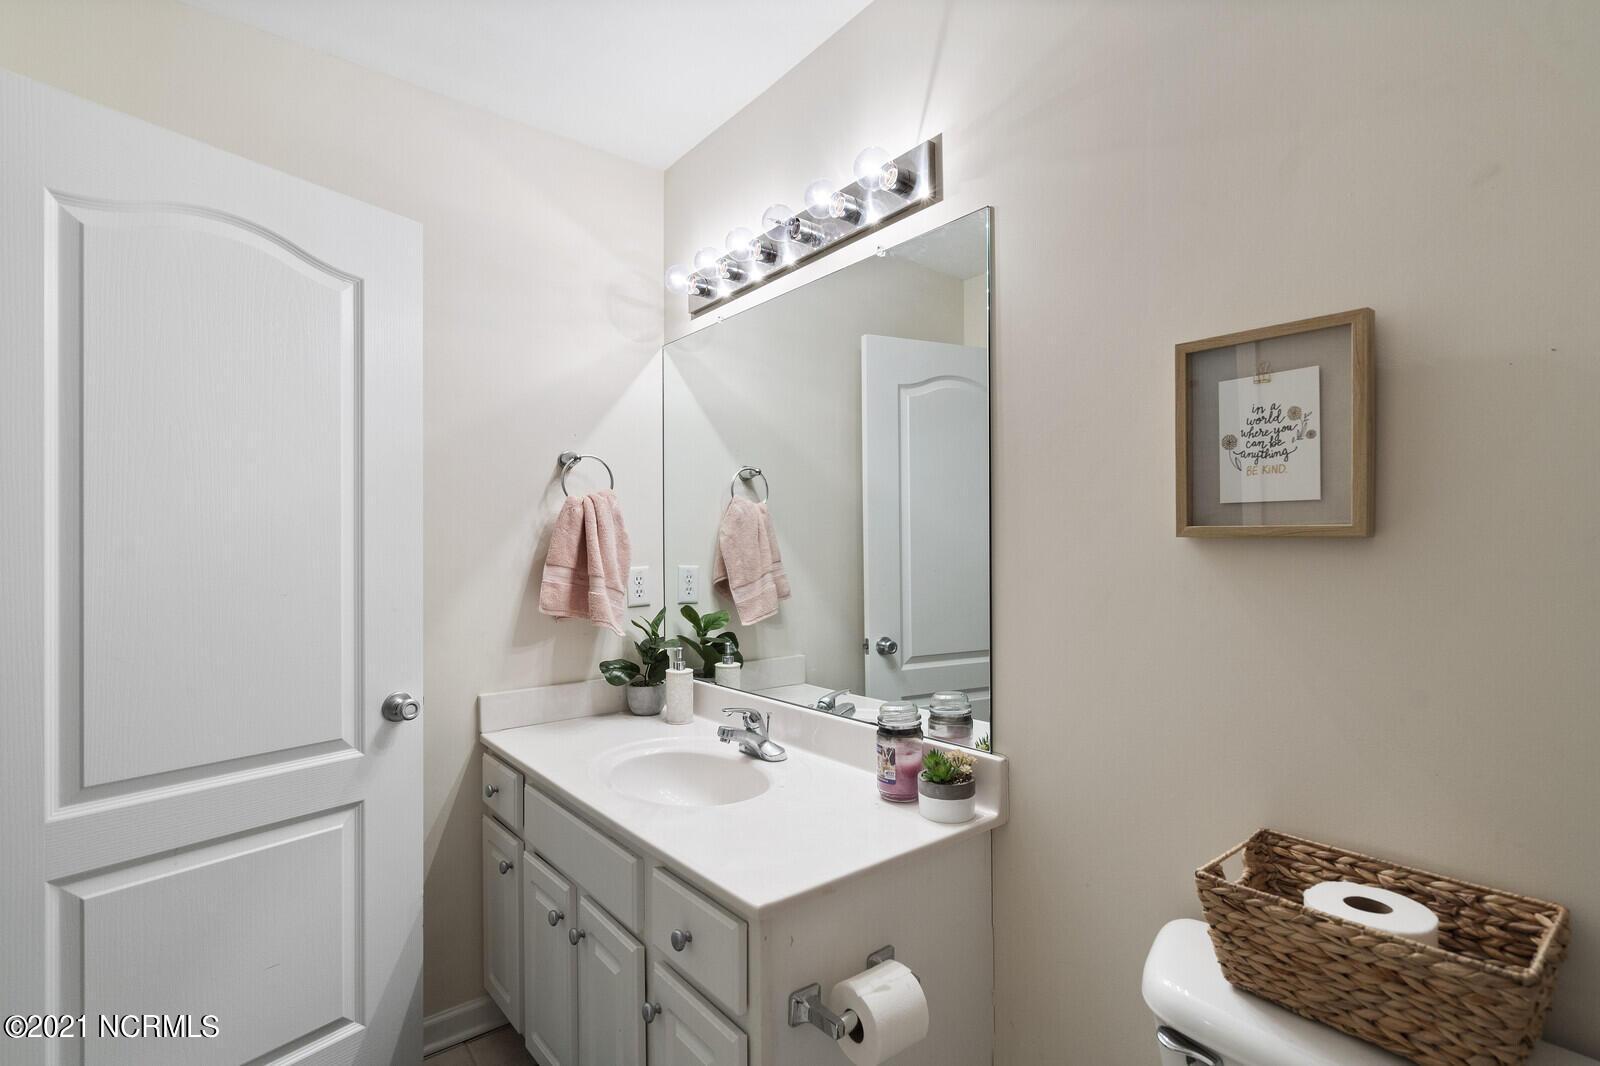 510 Triton Lane, Surf City, North Carolina 28445, 3 Bedrooms Bedrooms, 6 Rooms Rooms,2 BathroomsBathrooms,Townhouse,For sale,Triton,100283925